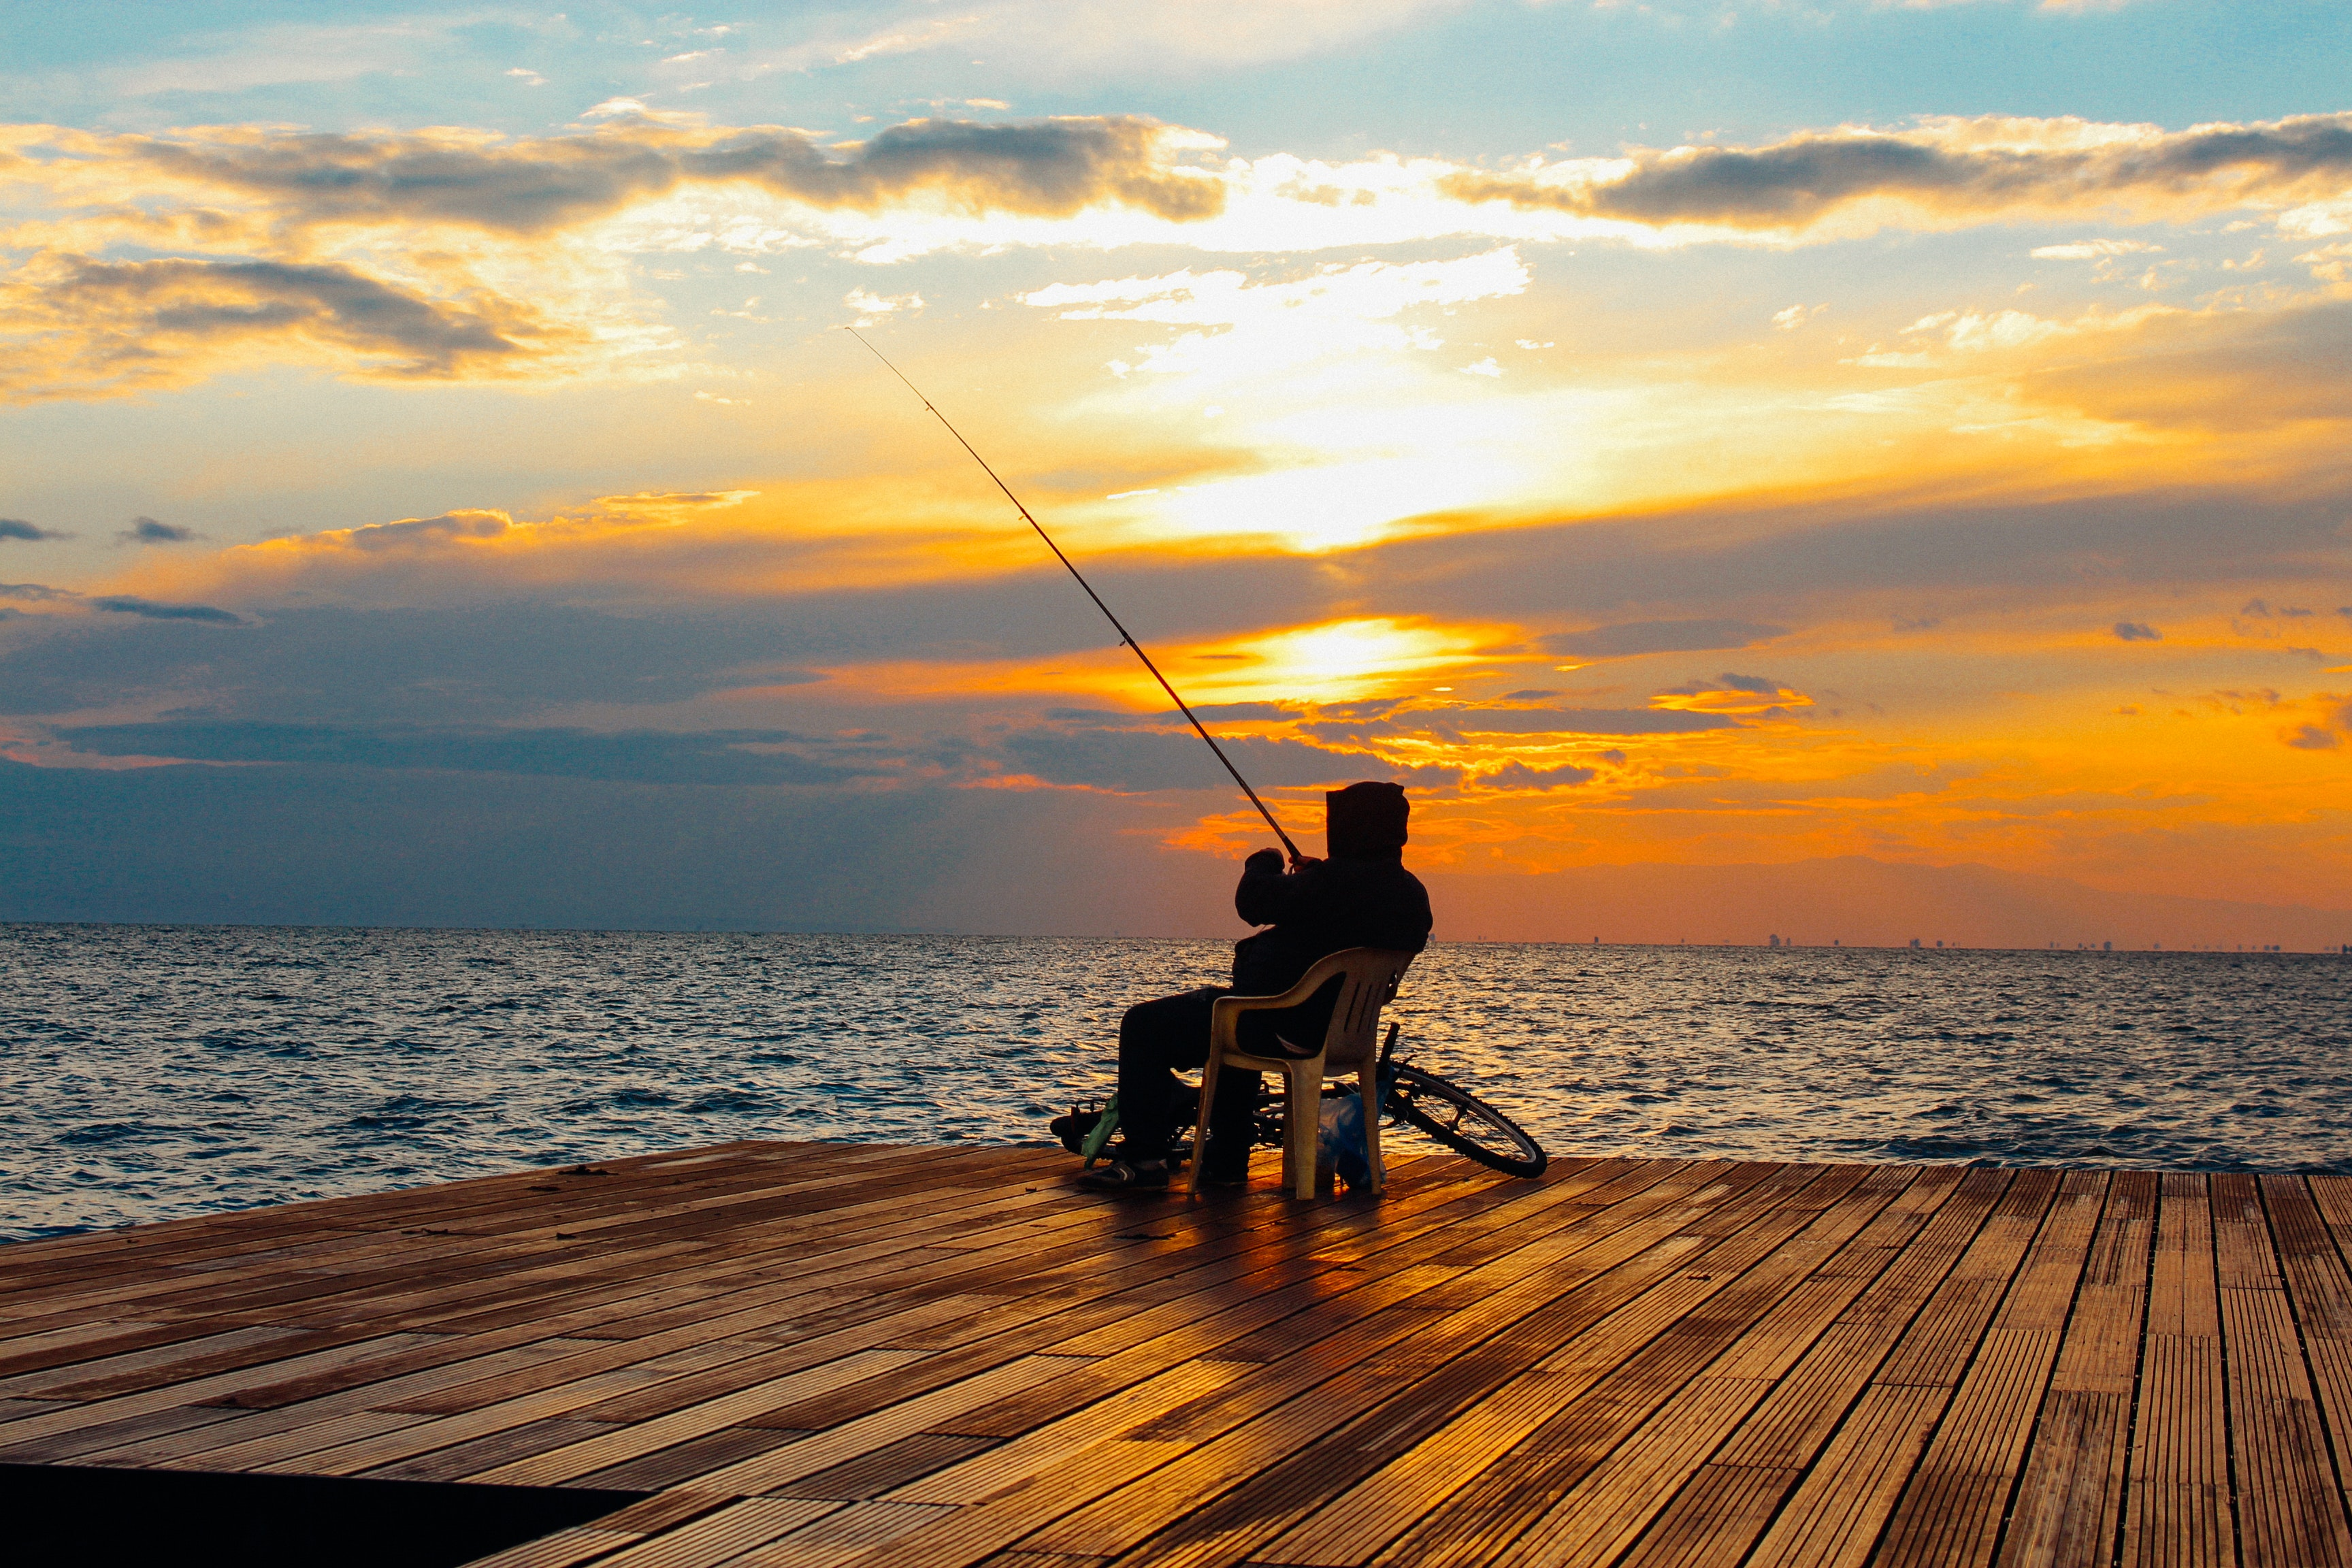 La pêche, que du bonheur